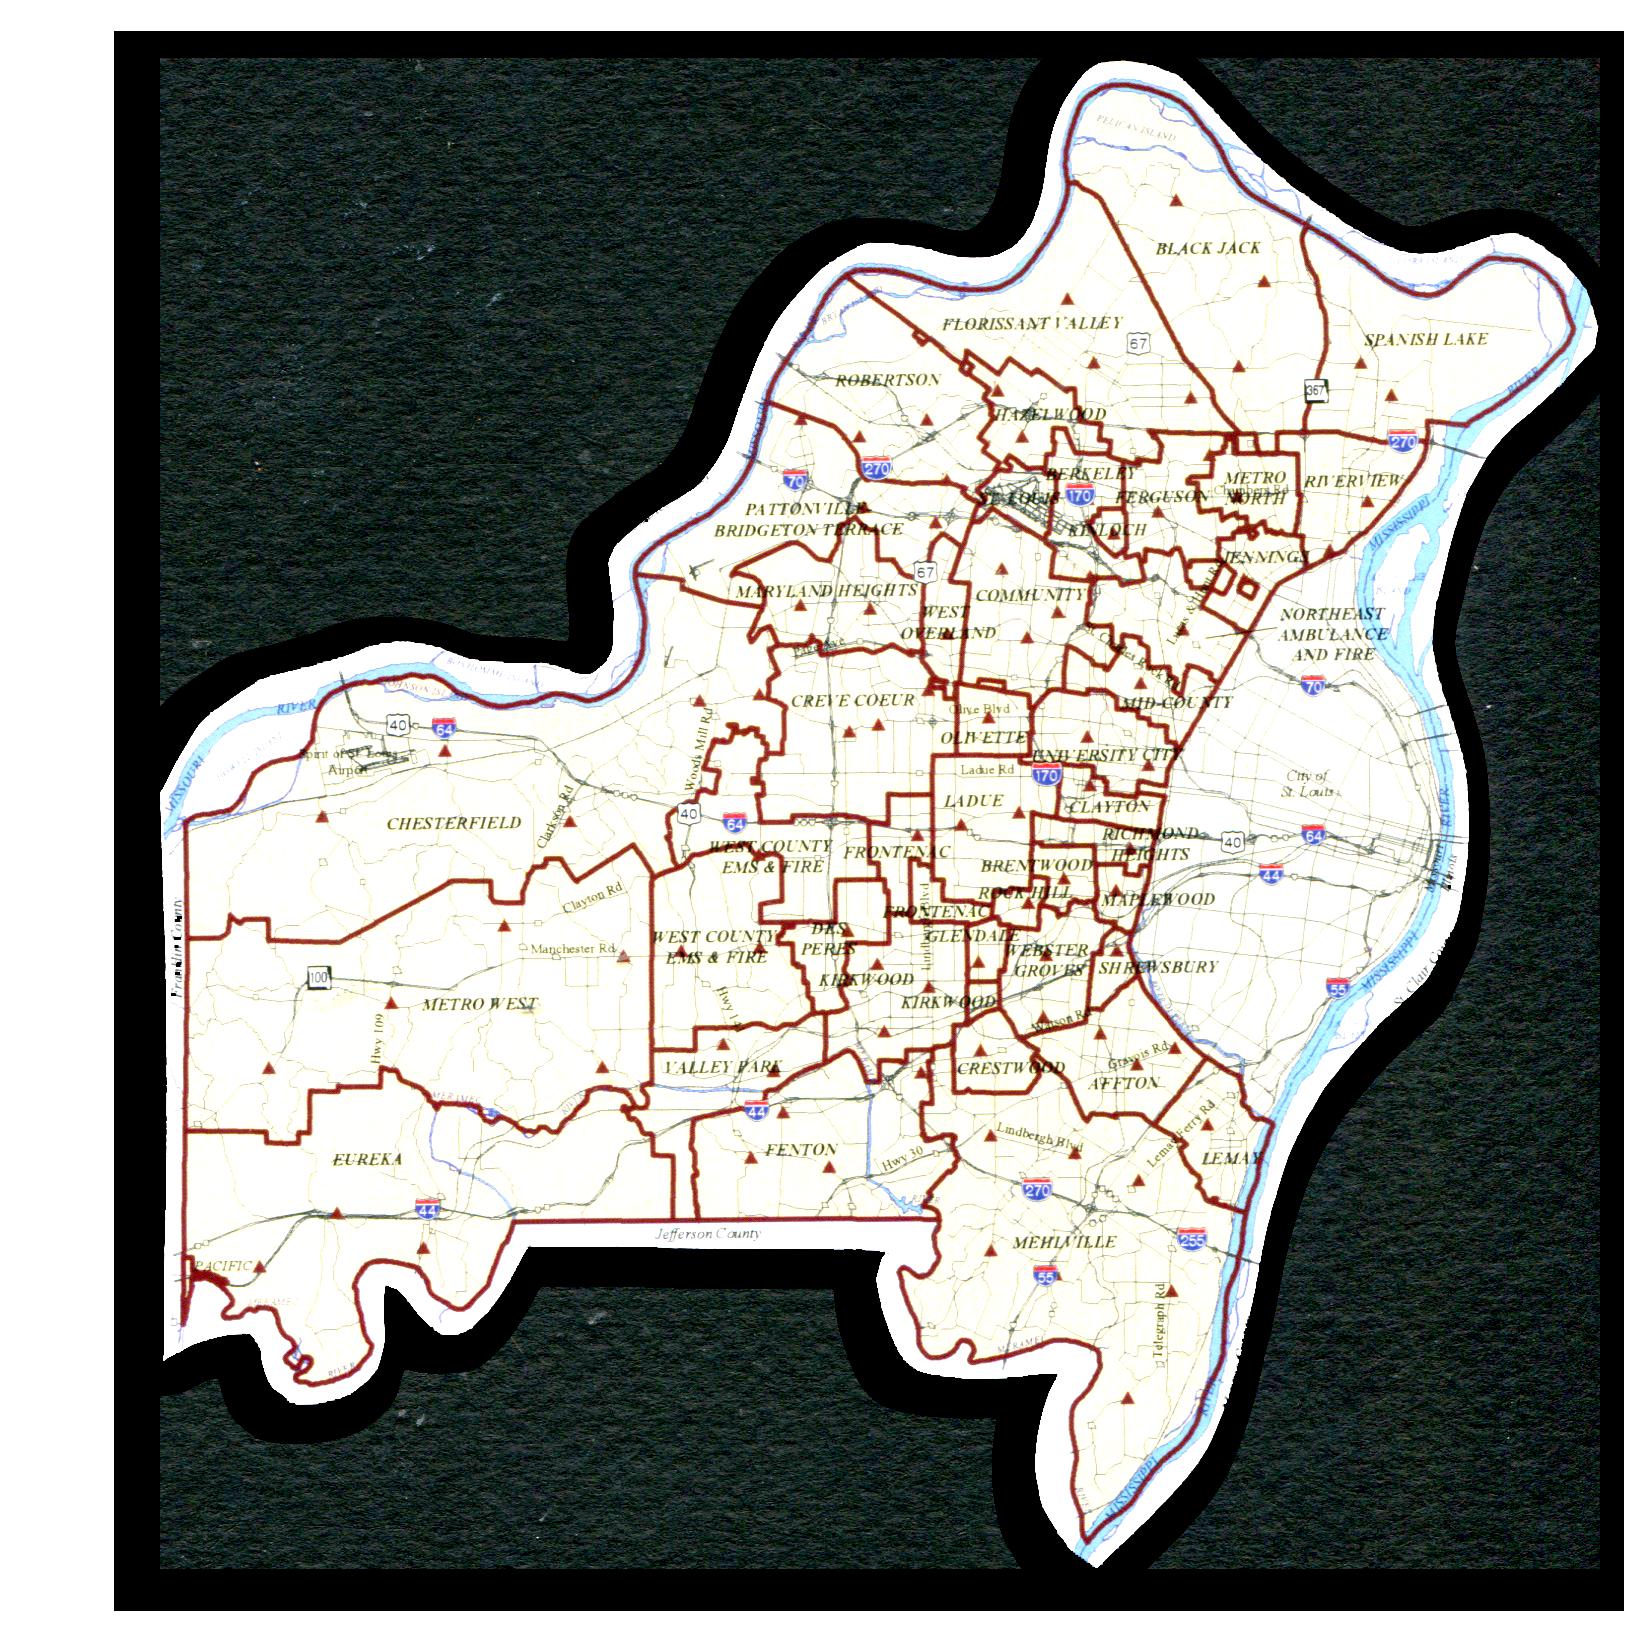 St. Louis,  Fire district map